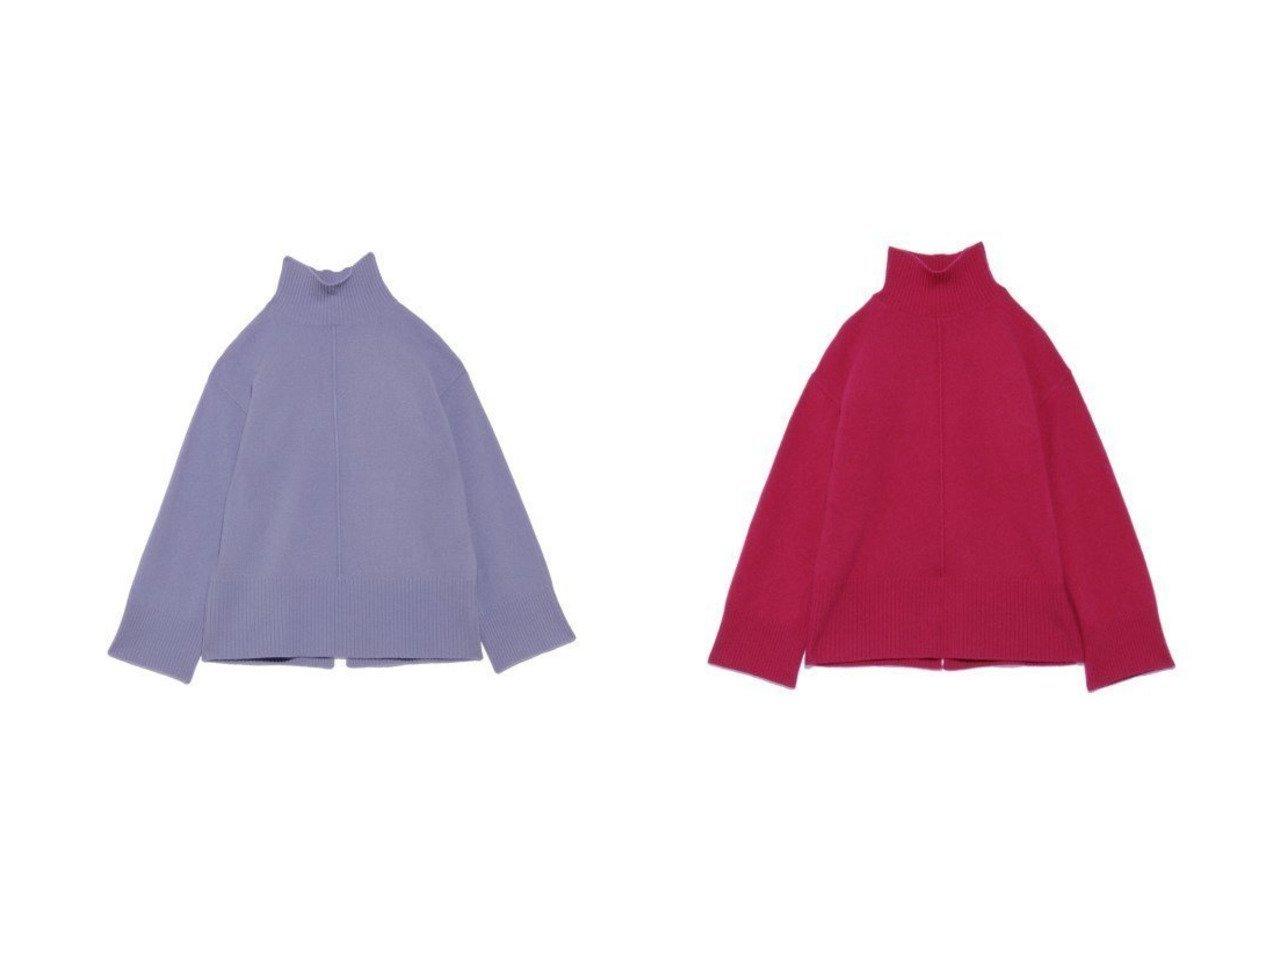 【Mila Owen/ミラオーウェン】の後スリットウールカシミアプルオーバー Mila Owenのおすすめ!人気、トレンド・レディースファッションの通販 おすすめで人気の流行・トレンド、ファッションの通販商品 メンズファッション・キッズファッション・インテリア・家具・レディースファッション・服の通販 founy(ファニー) https://founy.com/ ファッション Fashion レディースファッション WOMEN トップス カットソー Tops Tshirt ニット Knit Tops プルオーバー Pullover セーター |ID:crp329100000019936